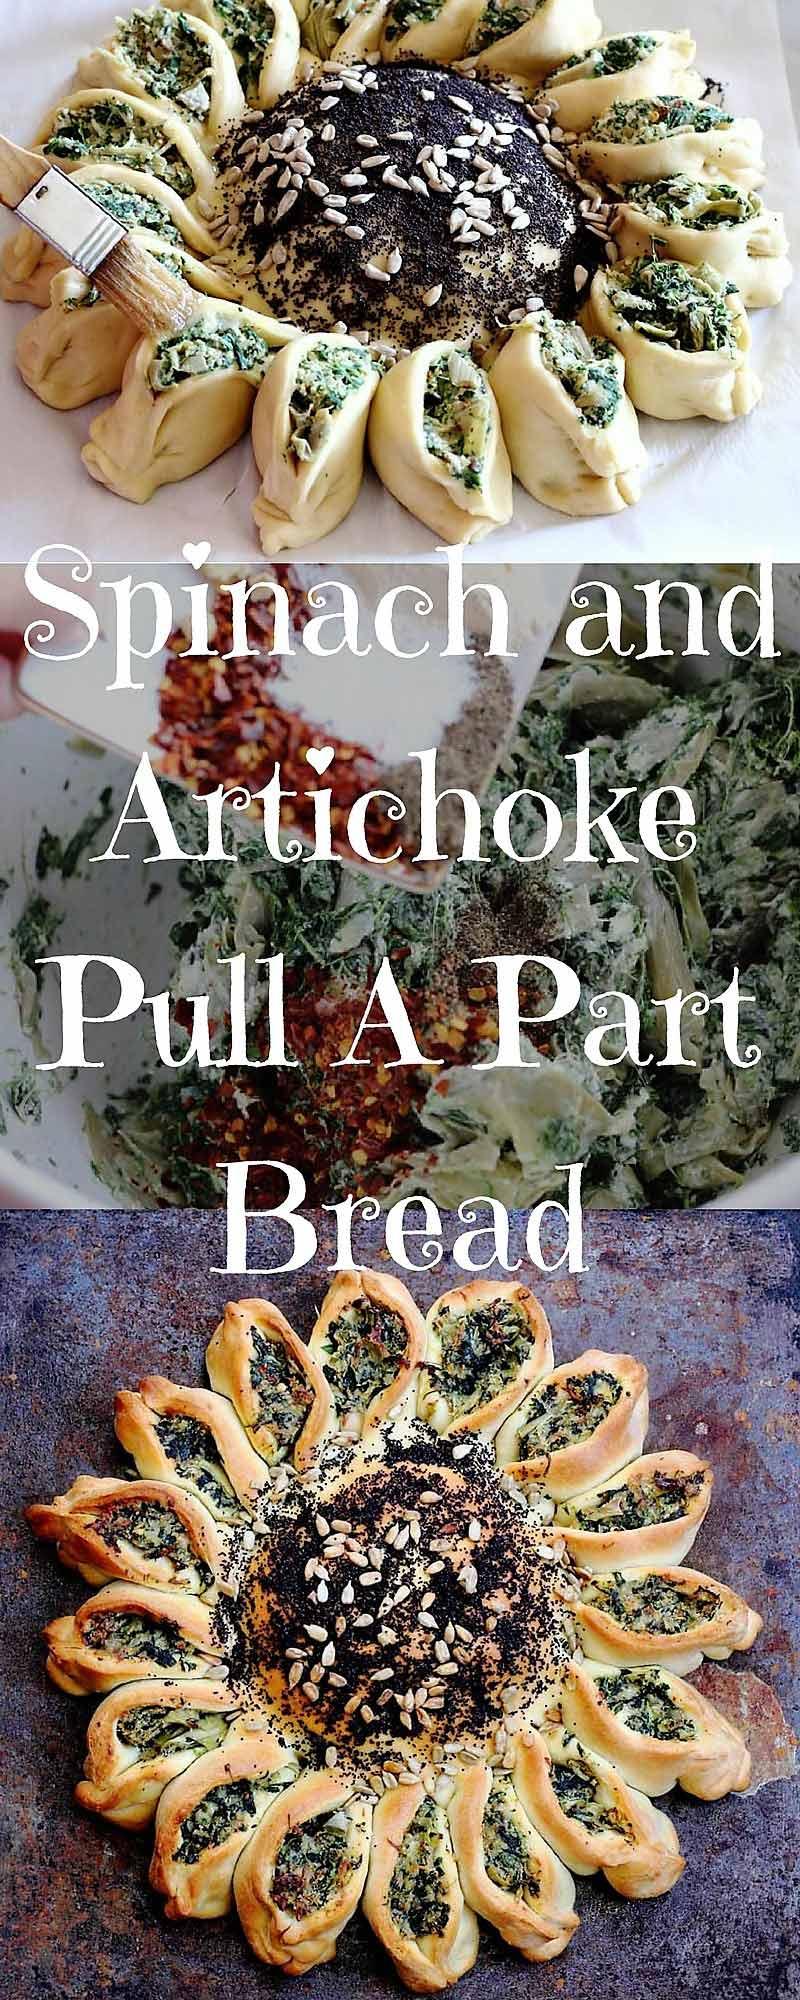 Spinach Artichoke dip stuffed in bread Pull A Part Bread